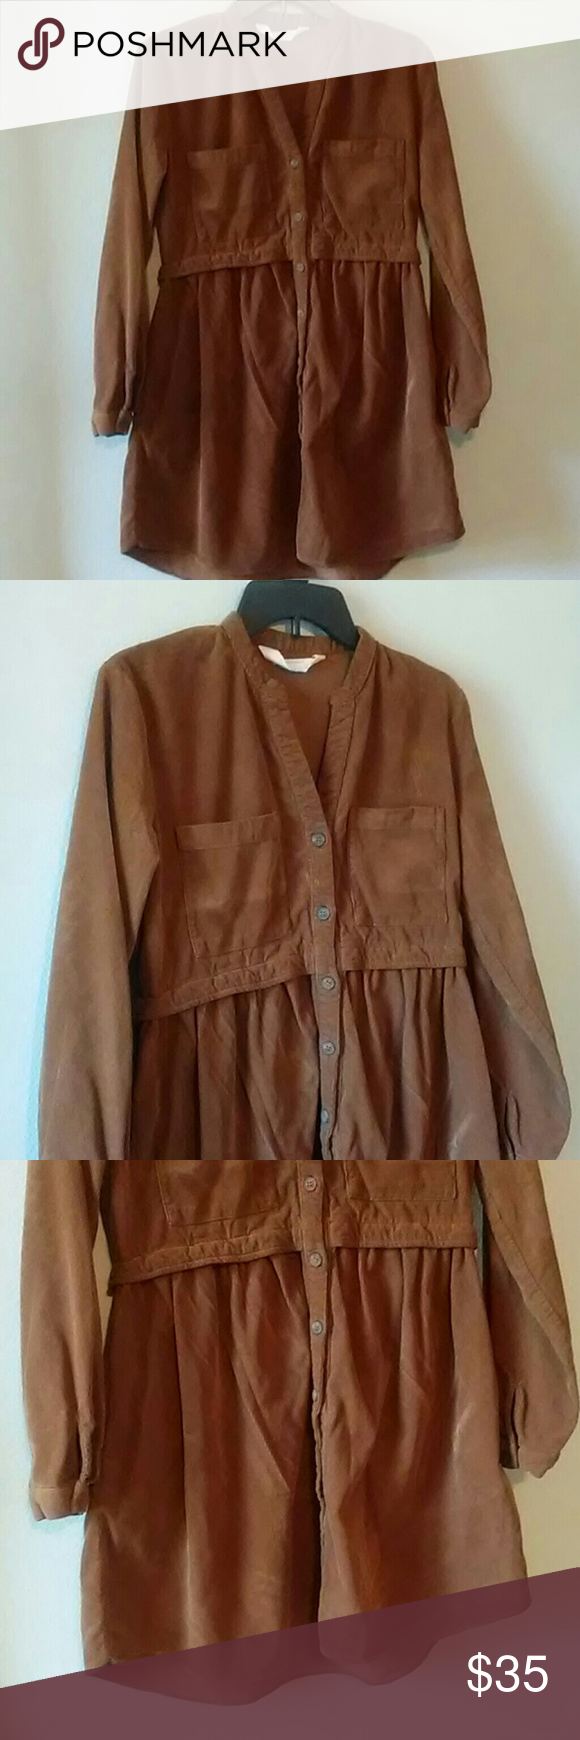 Zara Brown Corduroy Dress Corduroy Dress Zara Fashion [ 1740 x 580 Pixel ]